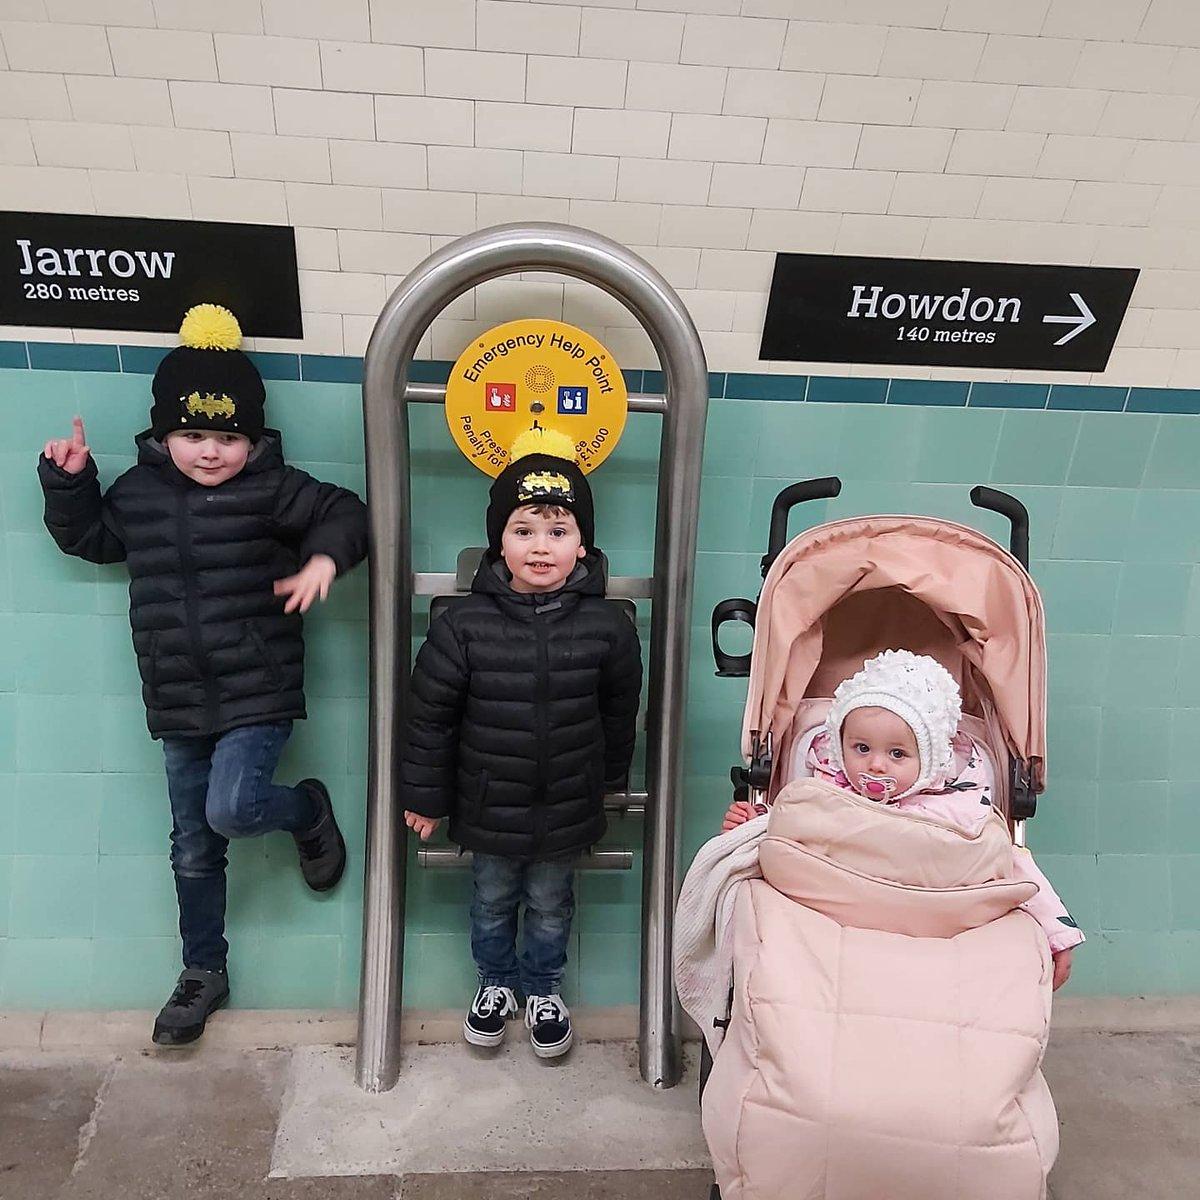 Pedestrian tunnel yesterday #jarrow #howdon